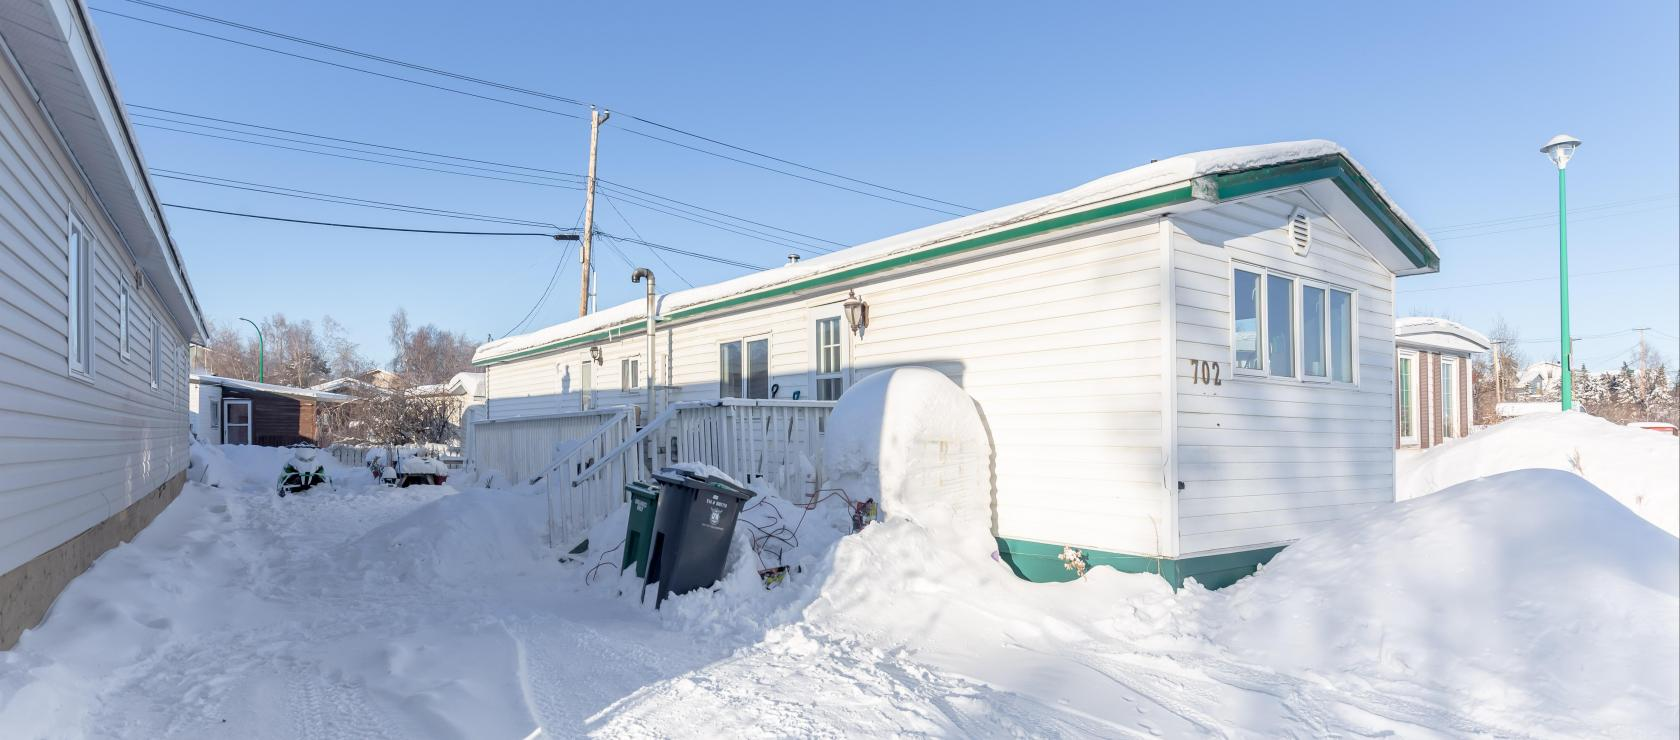 702 Bigelow Crescent, Kam Lake, Yellowknife 2